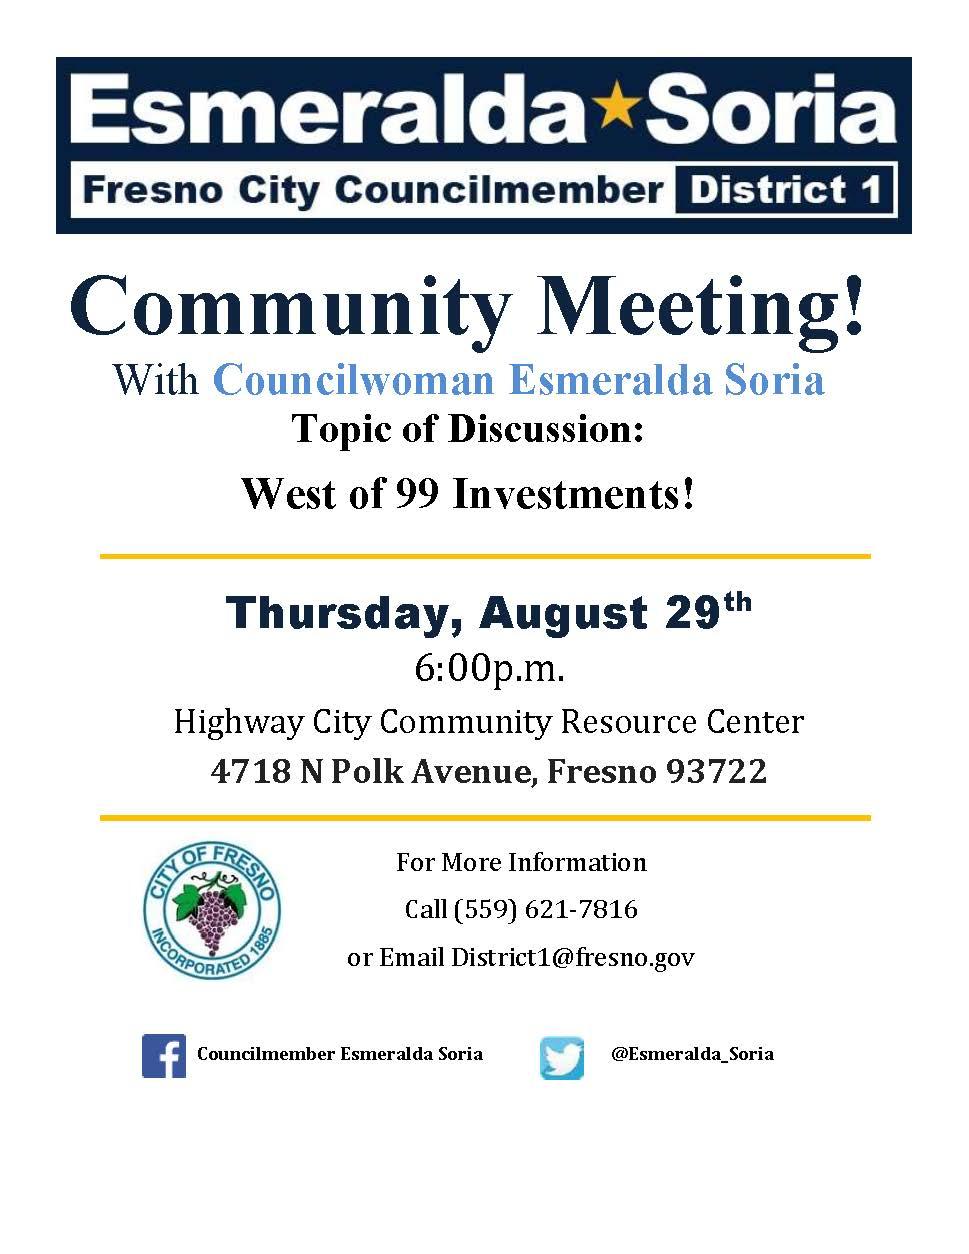 Esmeralda Soria Fresno City Councilmember District 1 Community Meeting Flyer